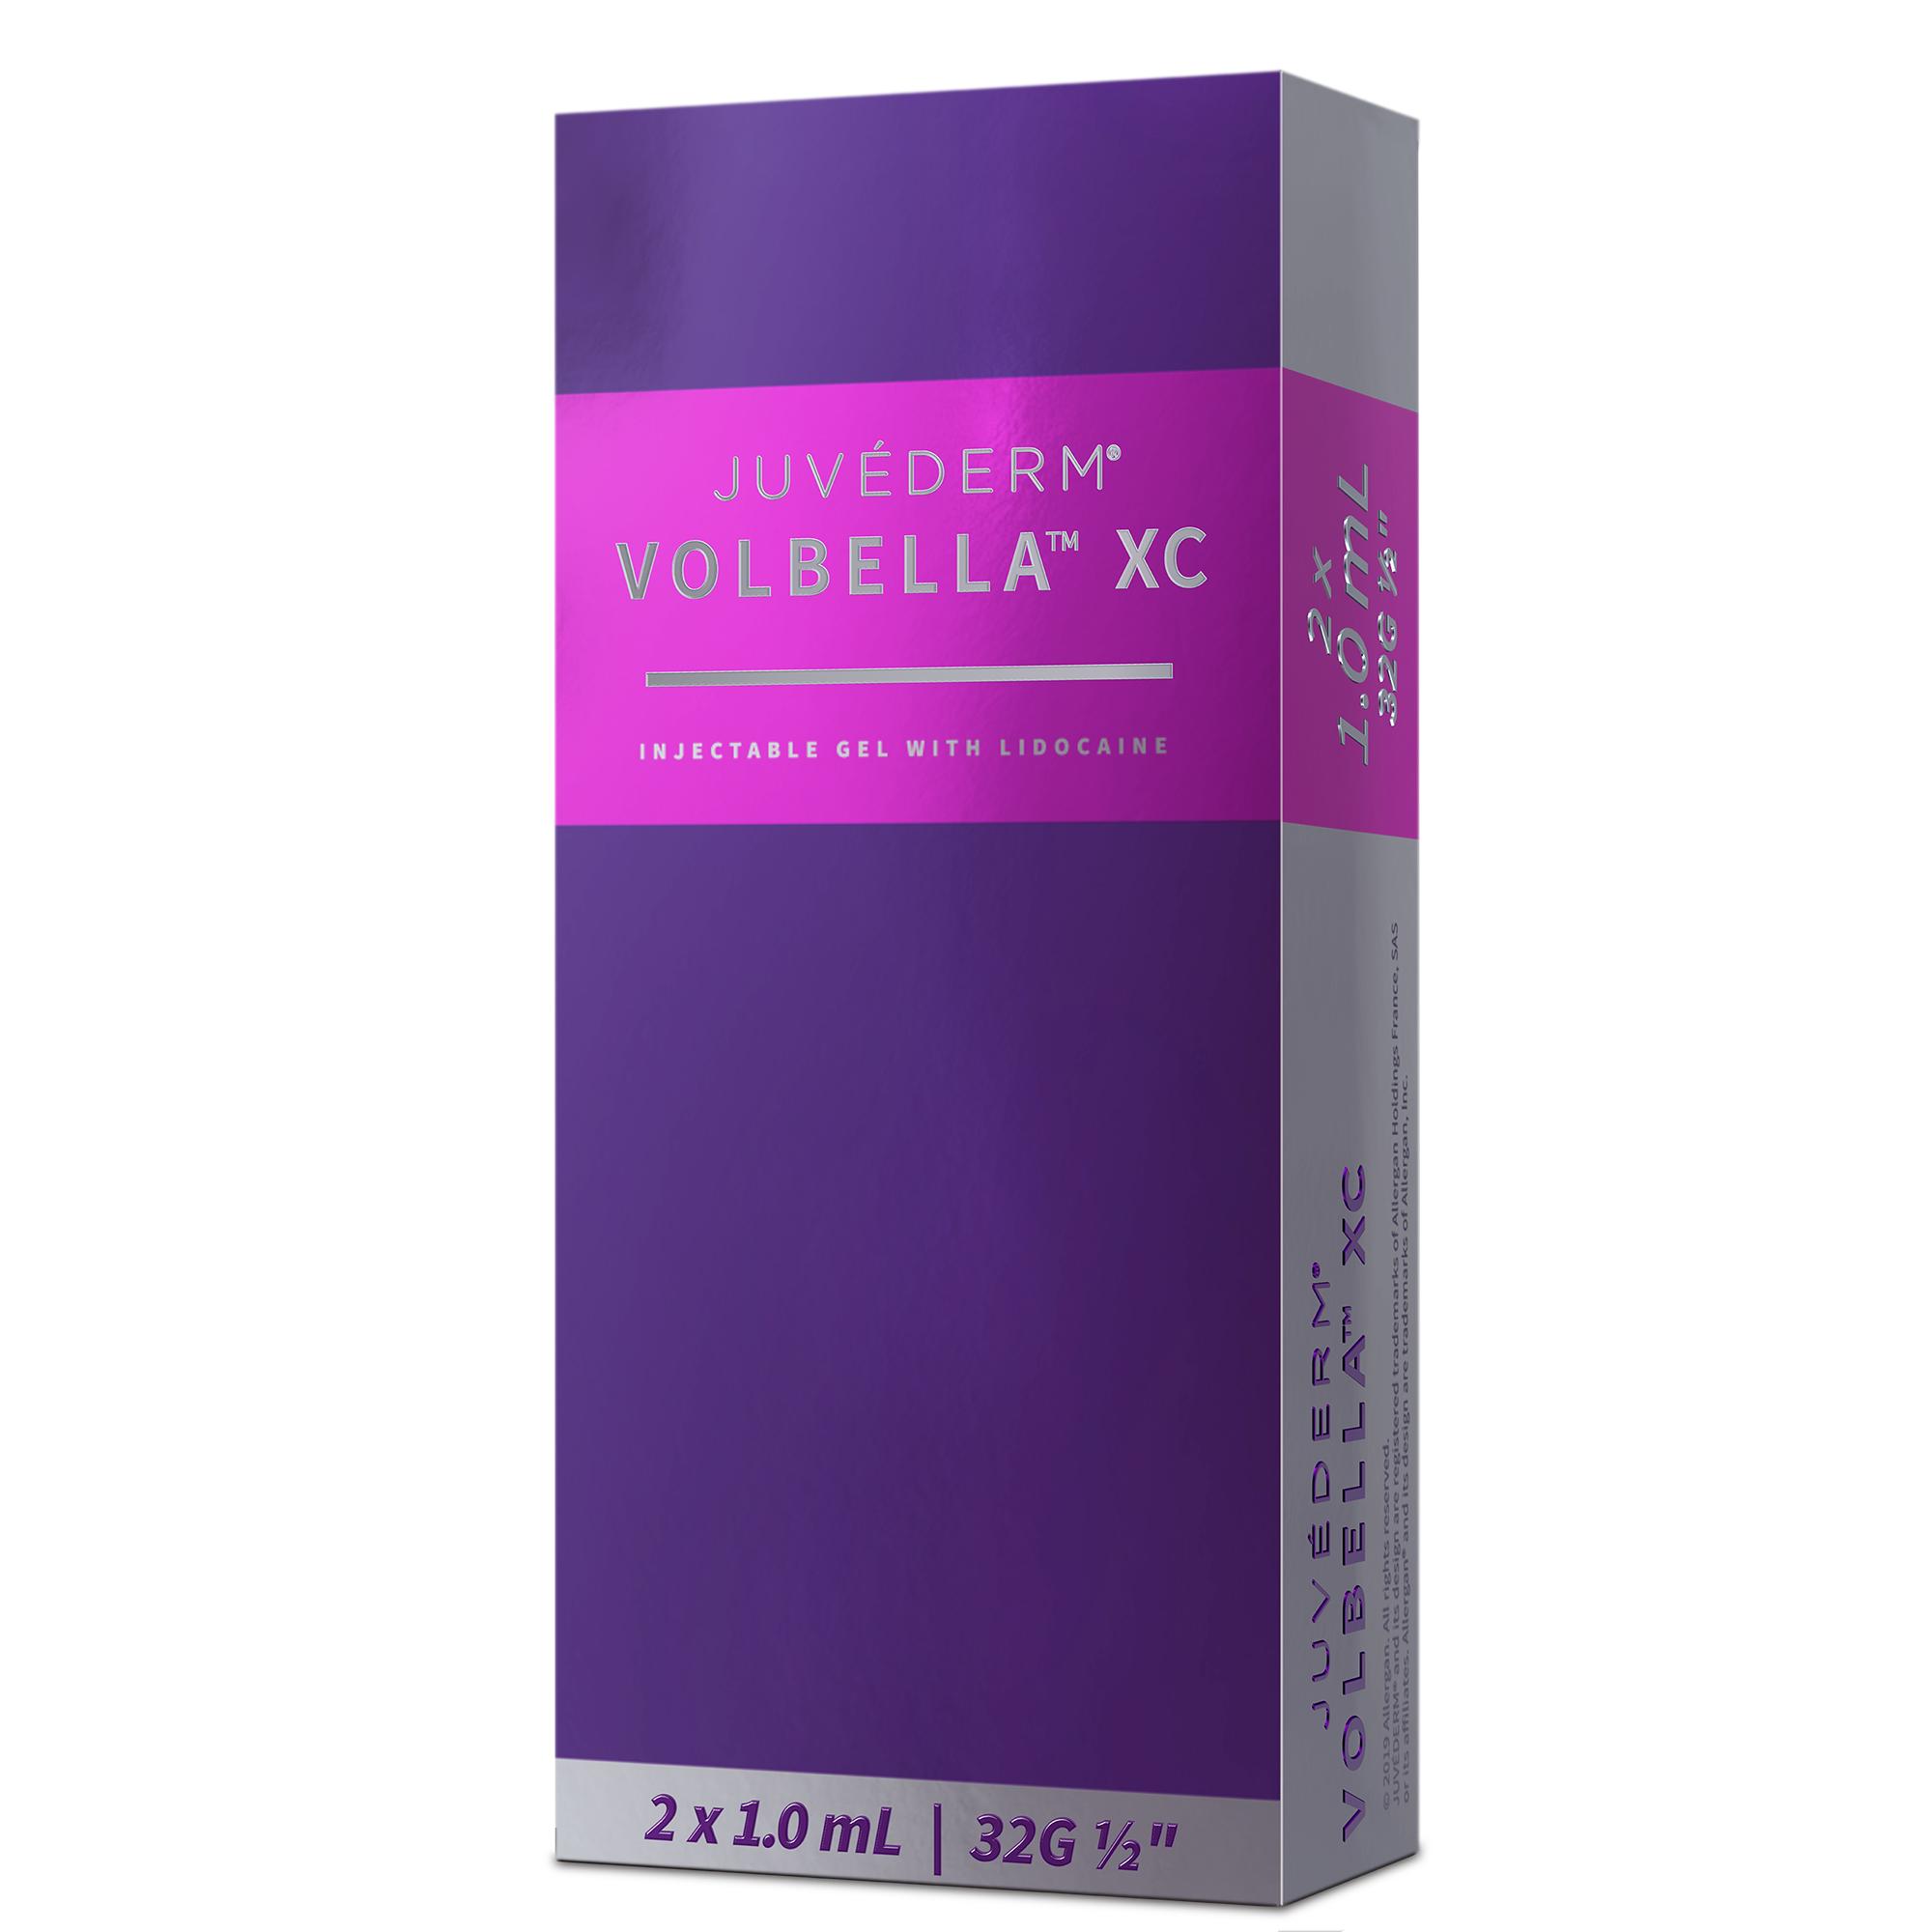 VolbellaXC_left facing_RGB_2000px